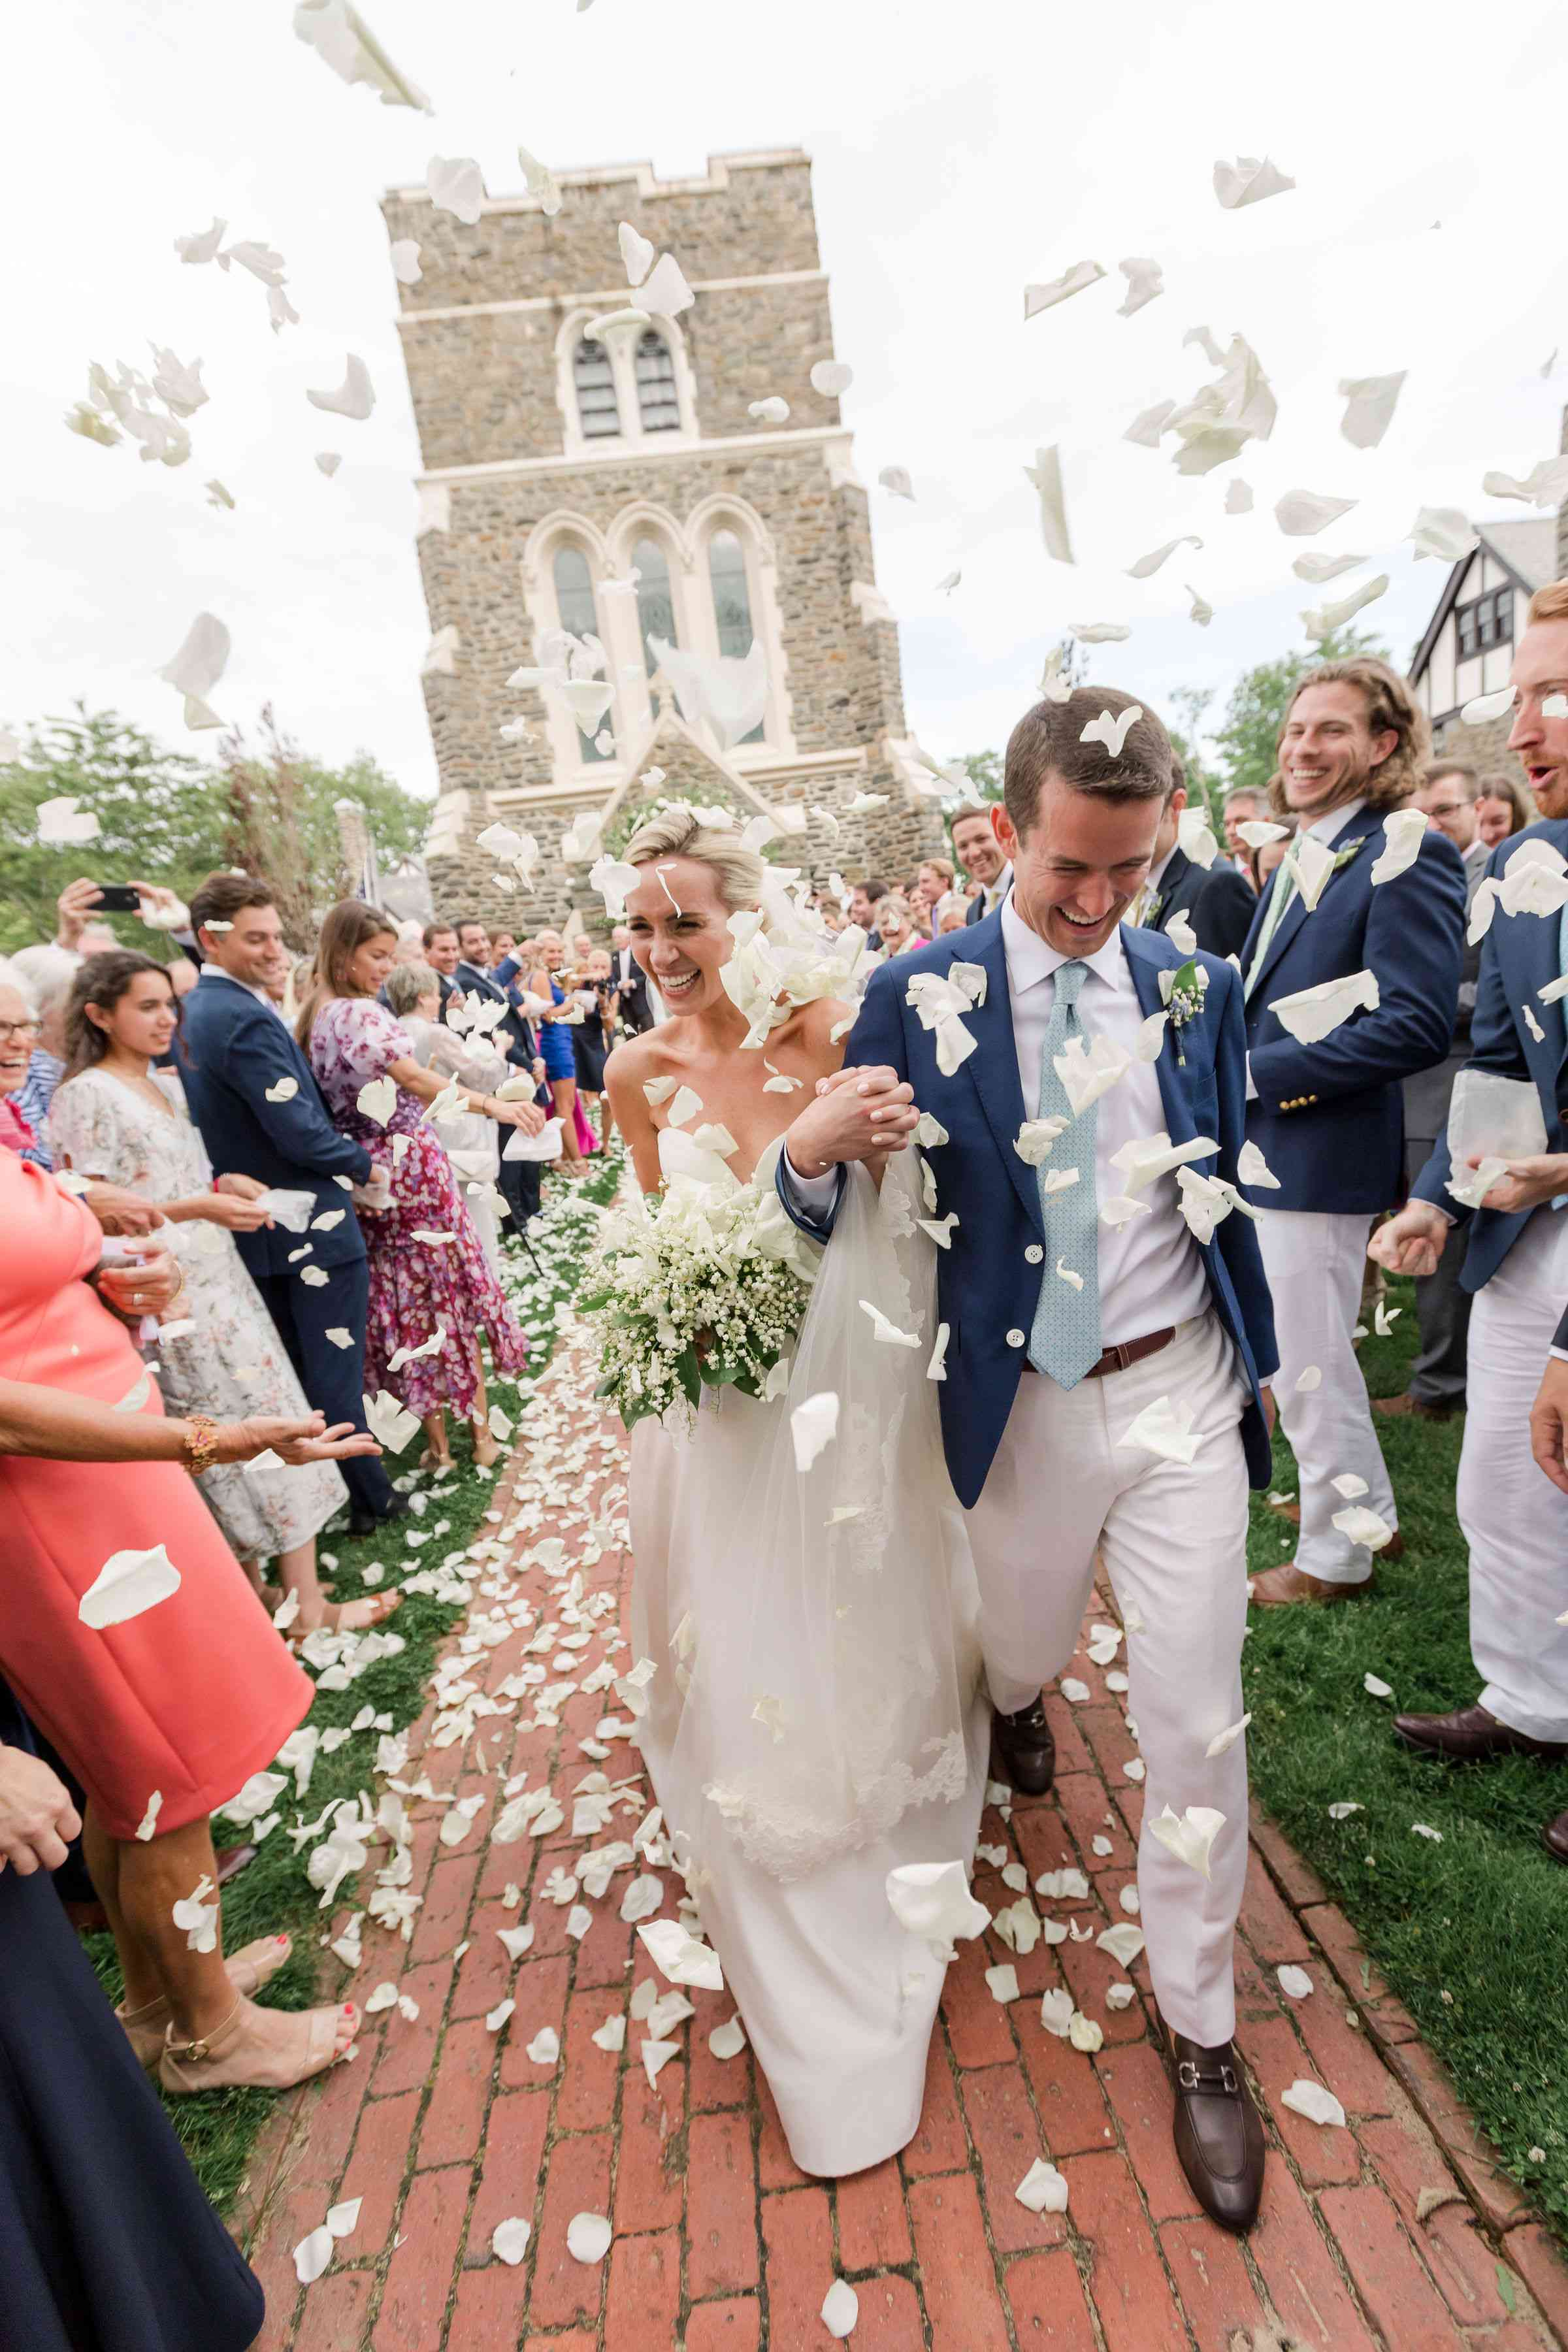 petal toss ceremony exit